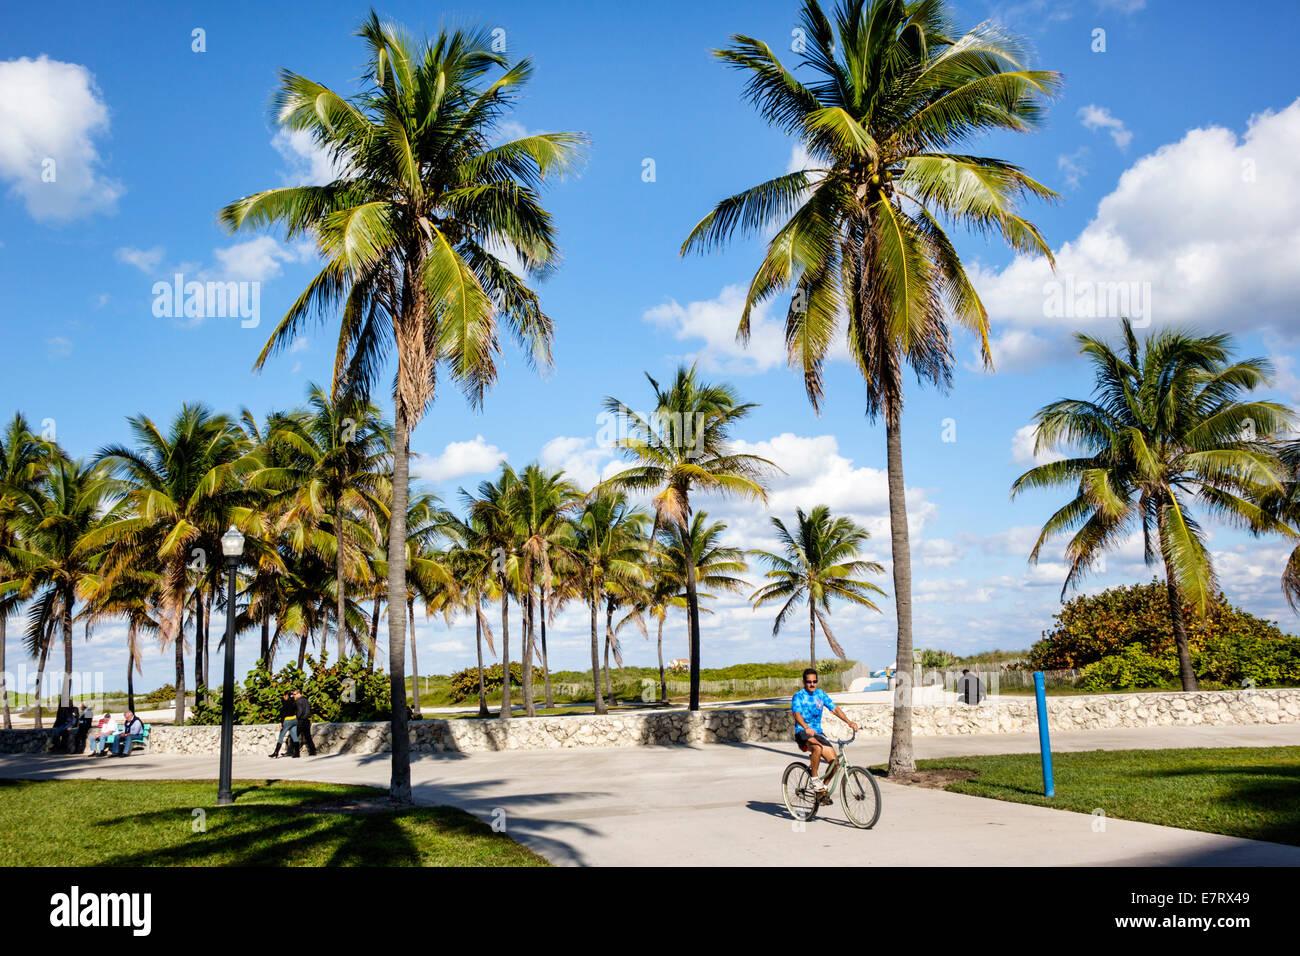 Miami Beach Florida Lummus Park Serpentine Trail palm trees bike path man biking bicycle good weather tropical - Stock Image